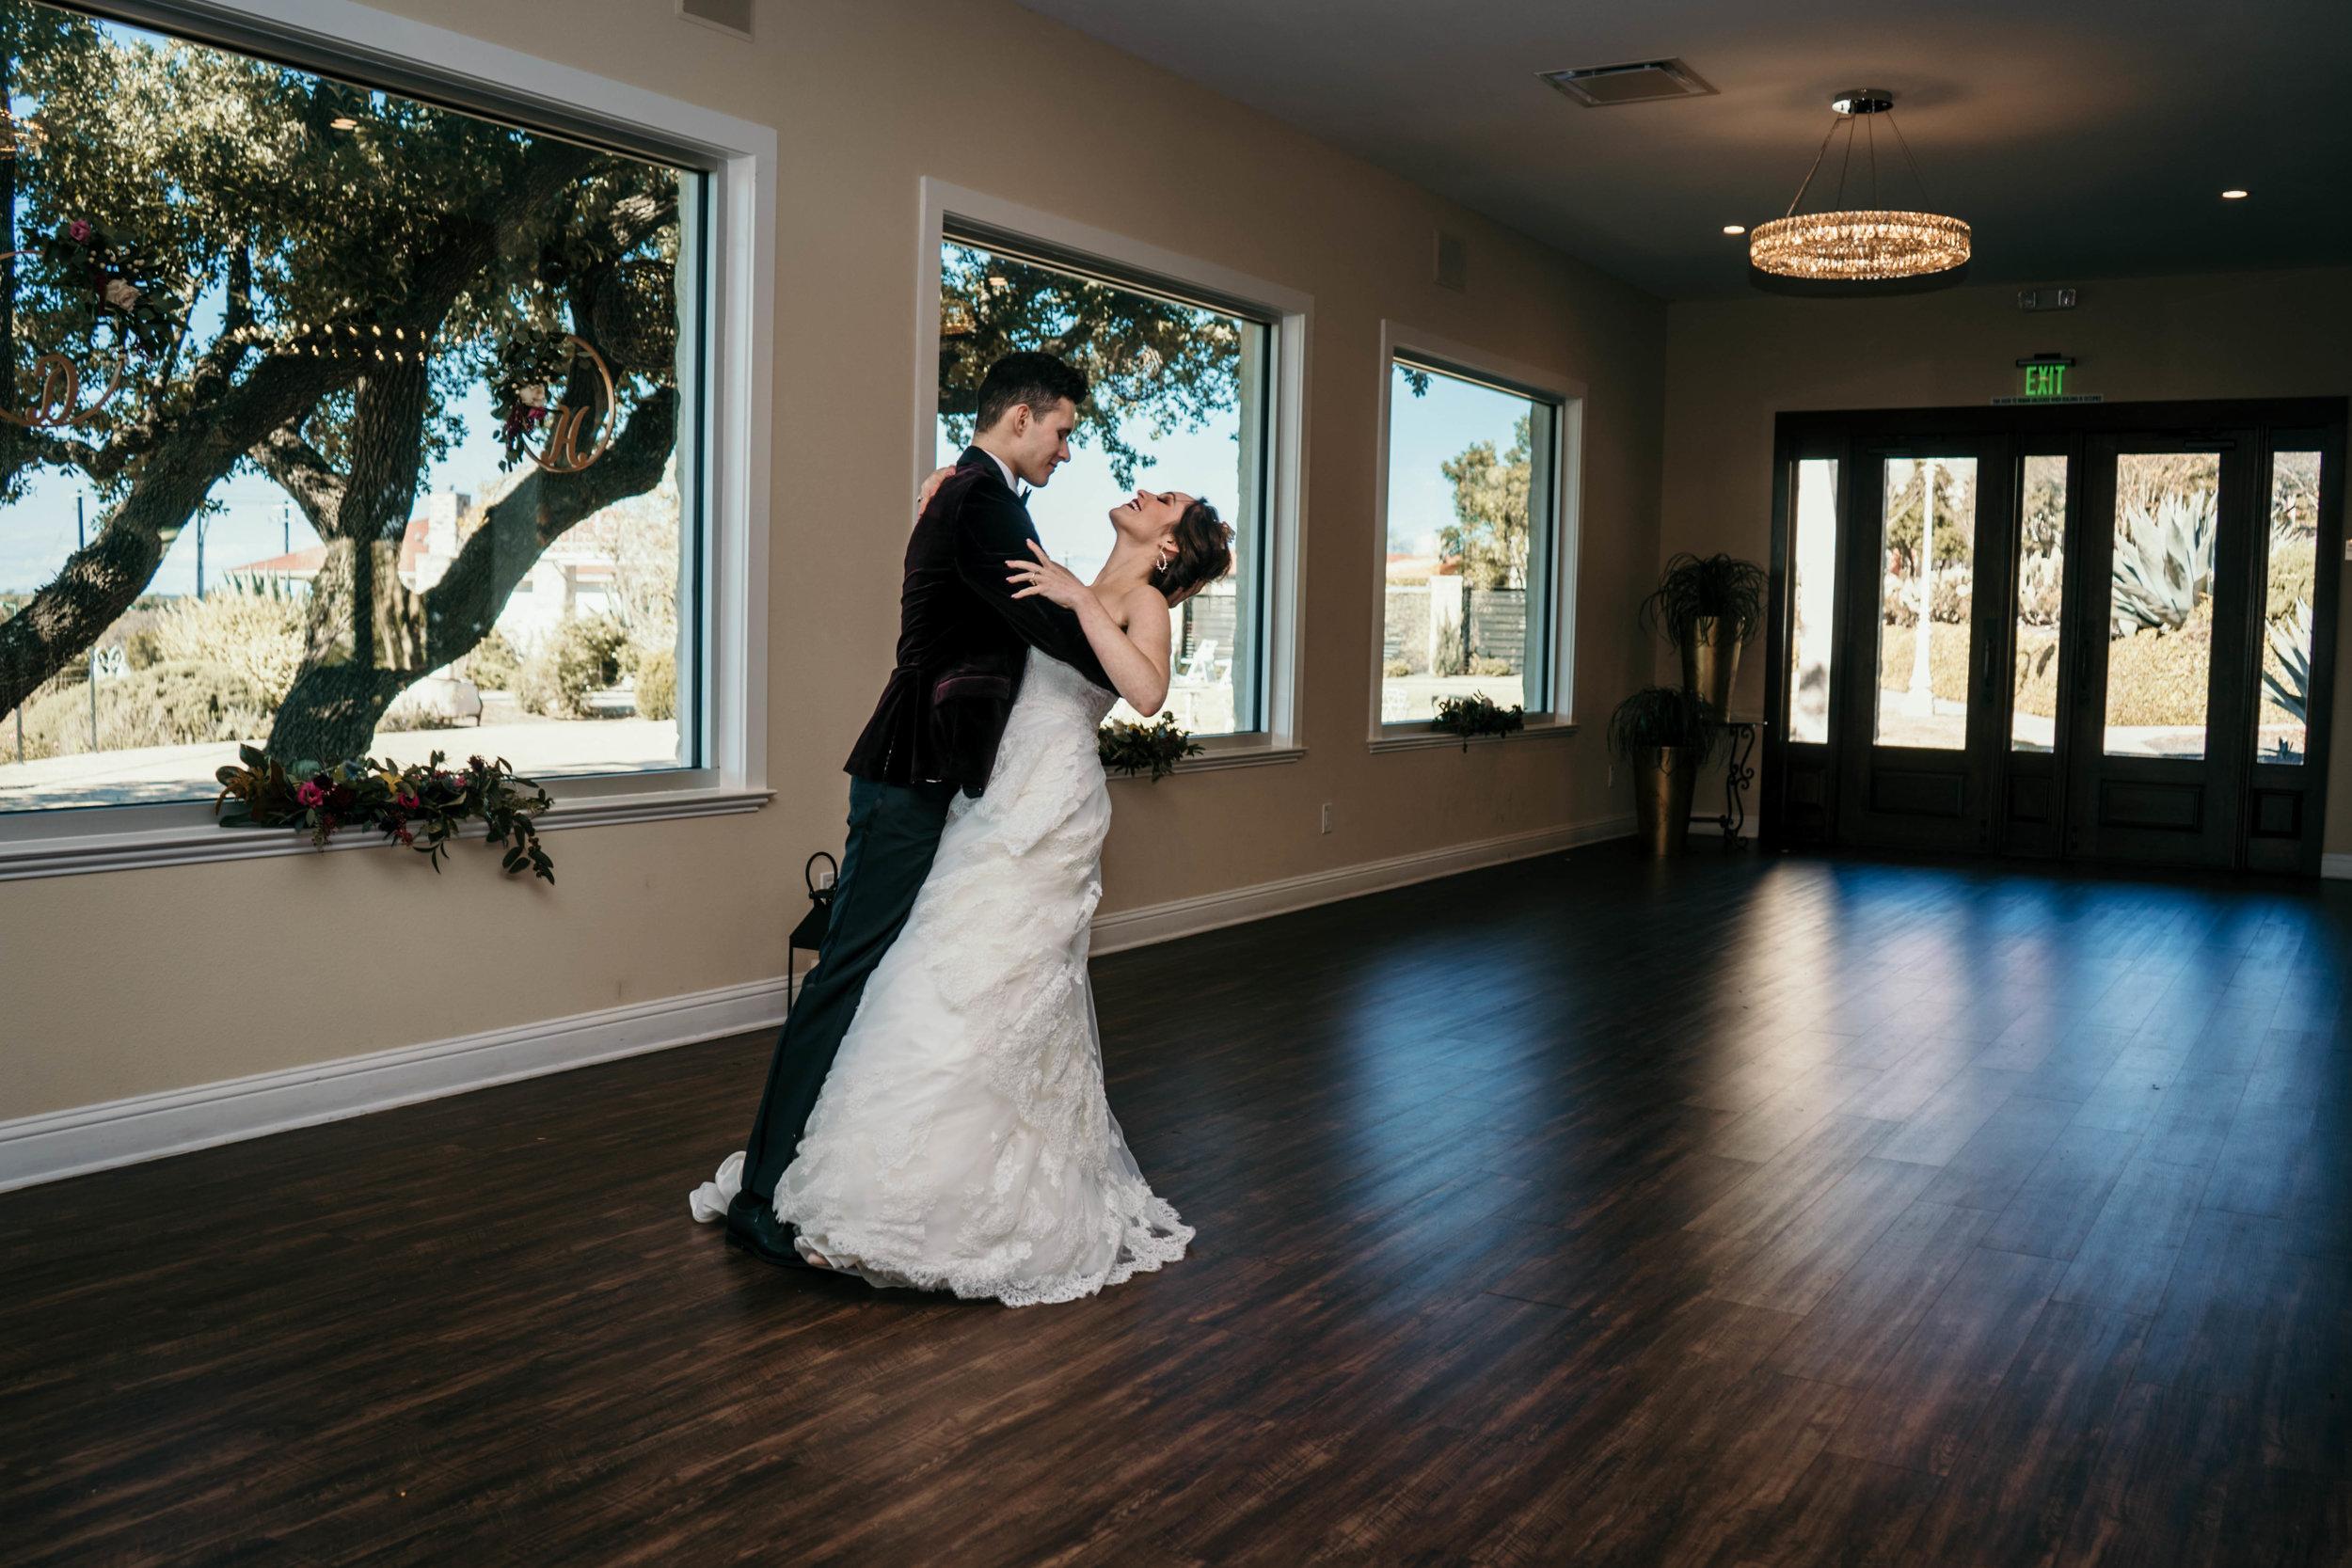 Austin Wedding Videographer - Dolls for Dolls (315 of 323).jpg